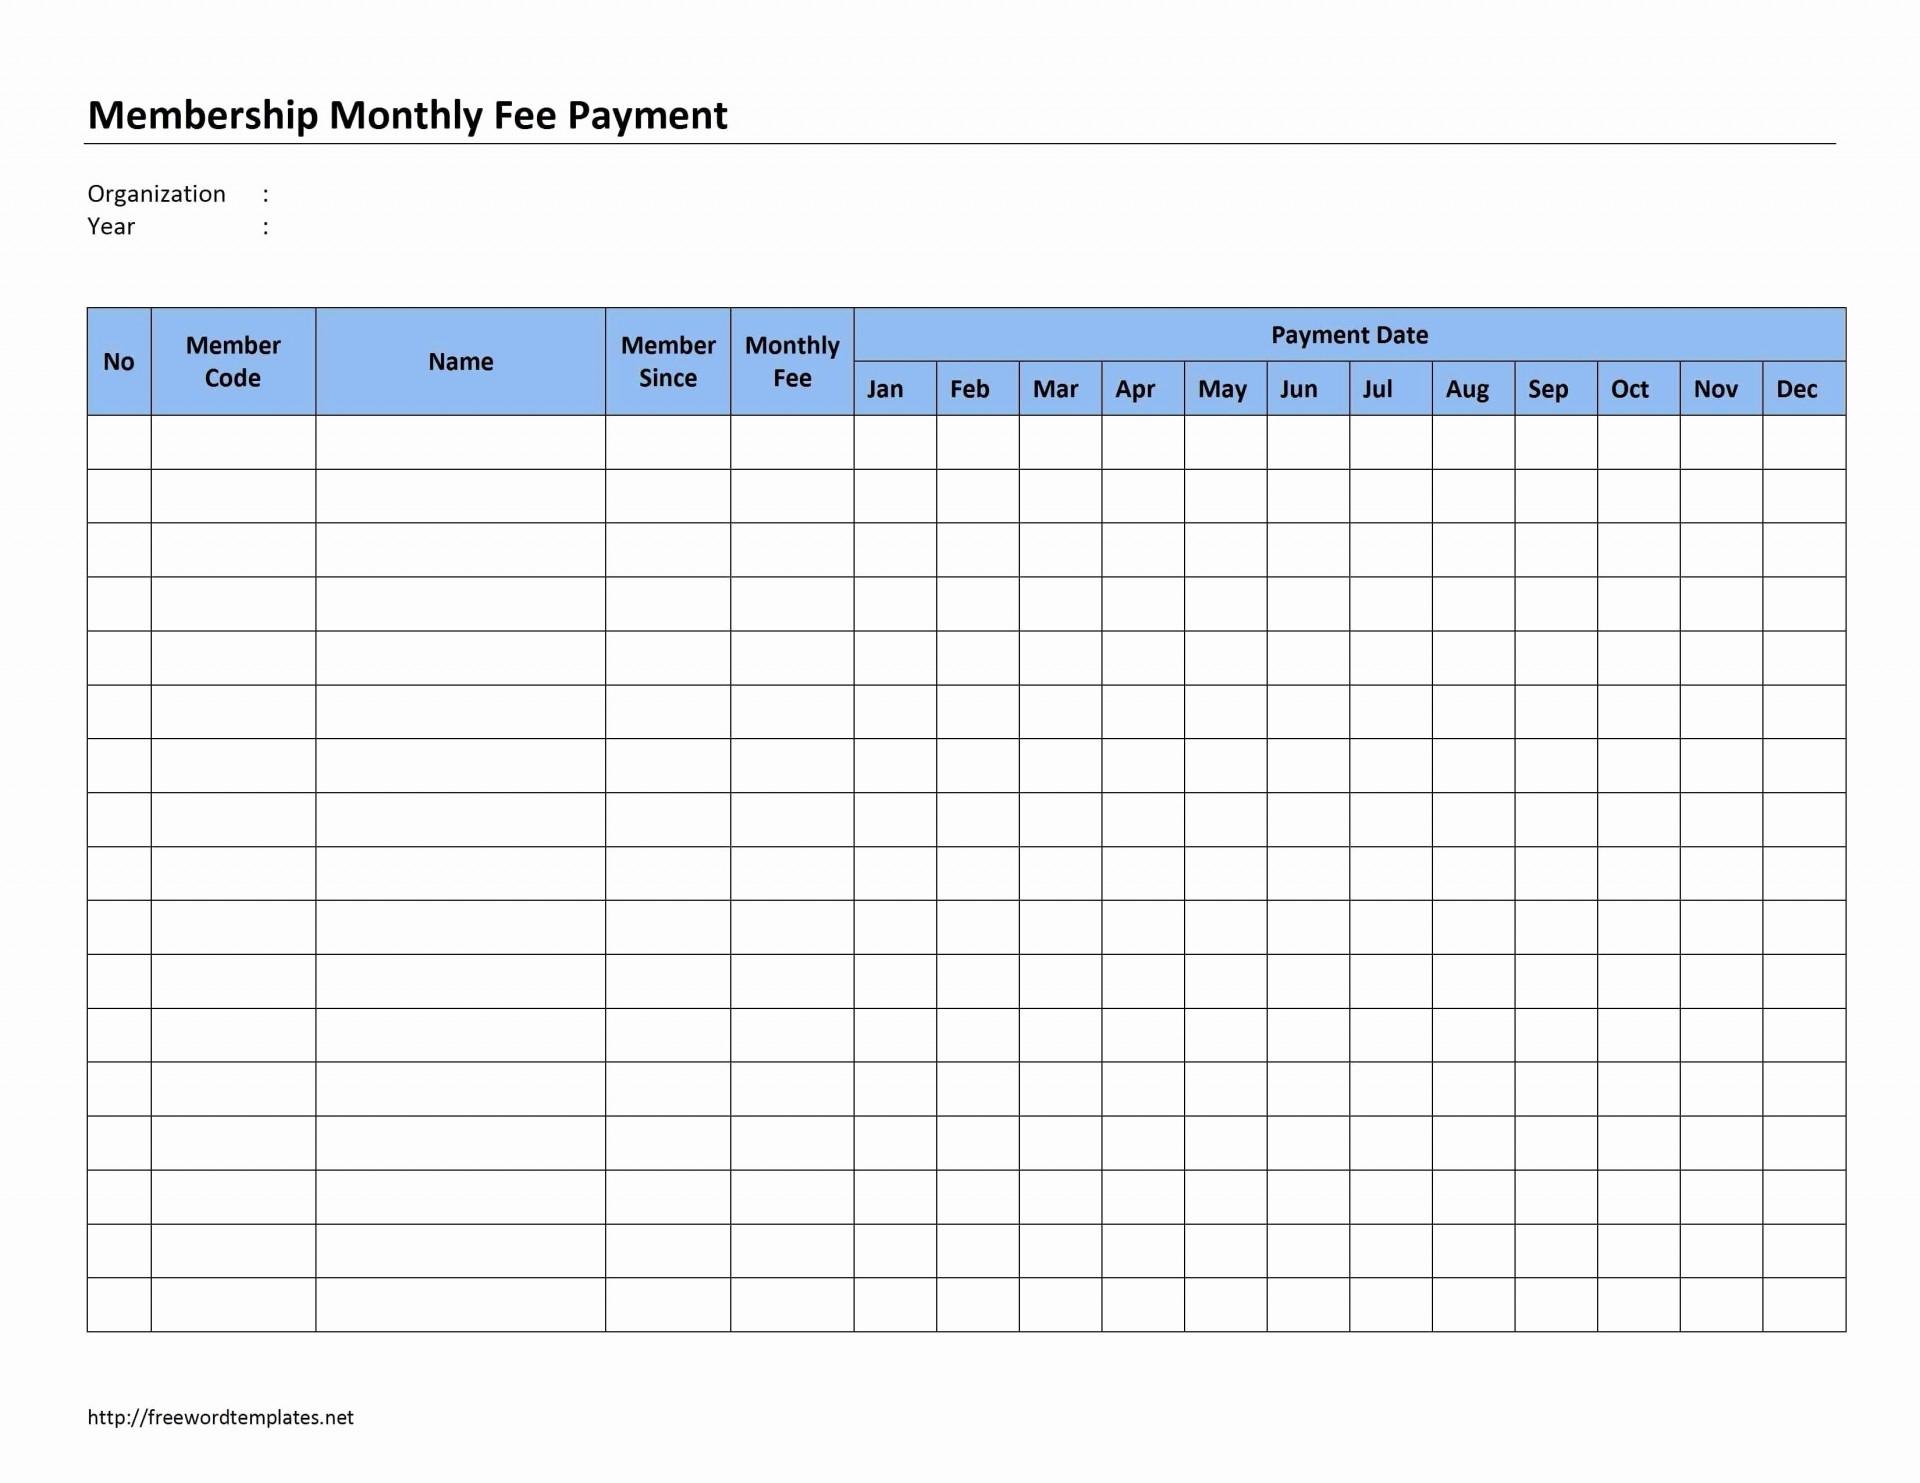 001 Template Ideas Monthly Bill Organizer Excel Free regarding Free Printable Bill Organizer